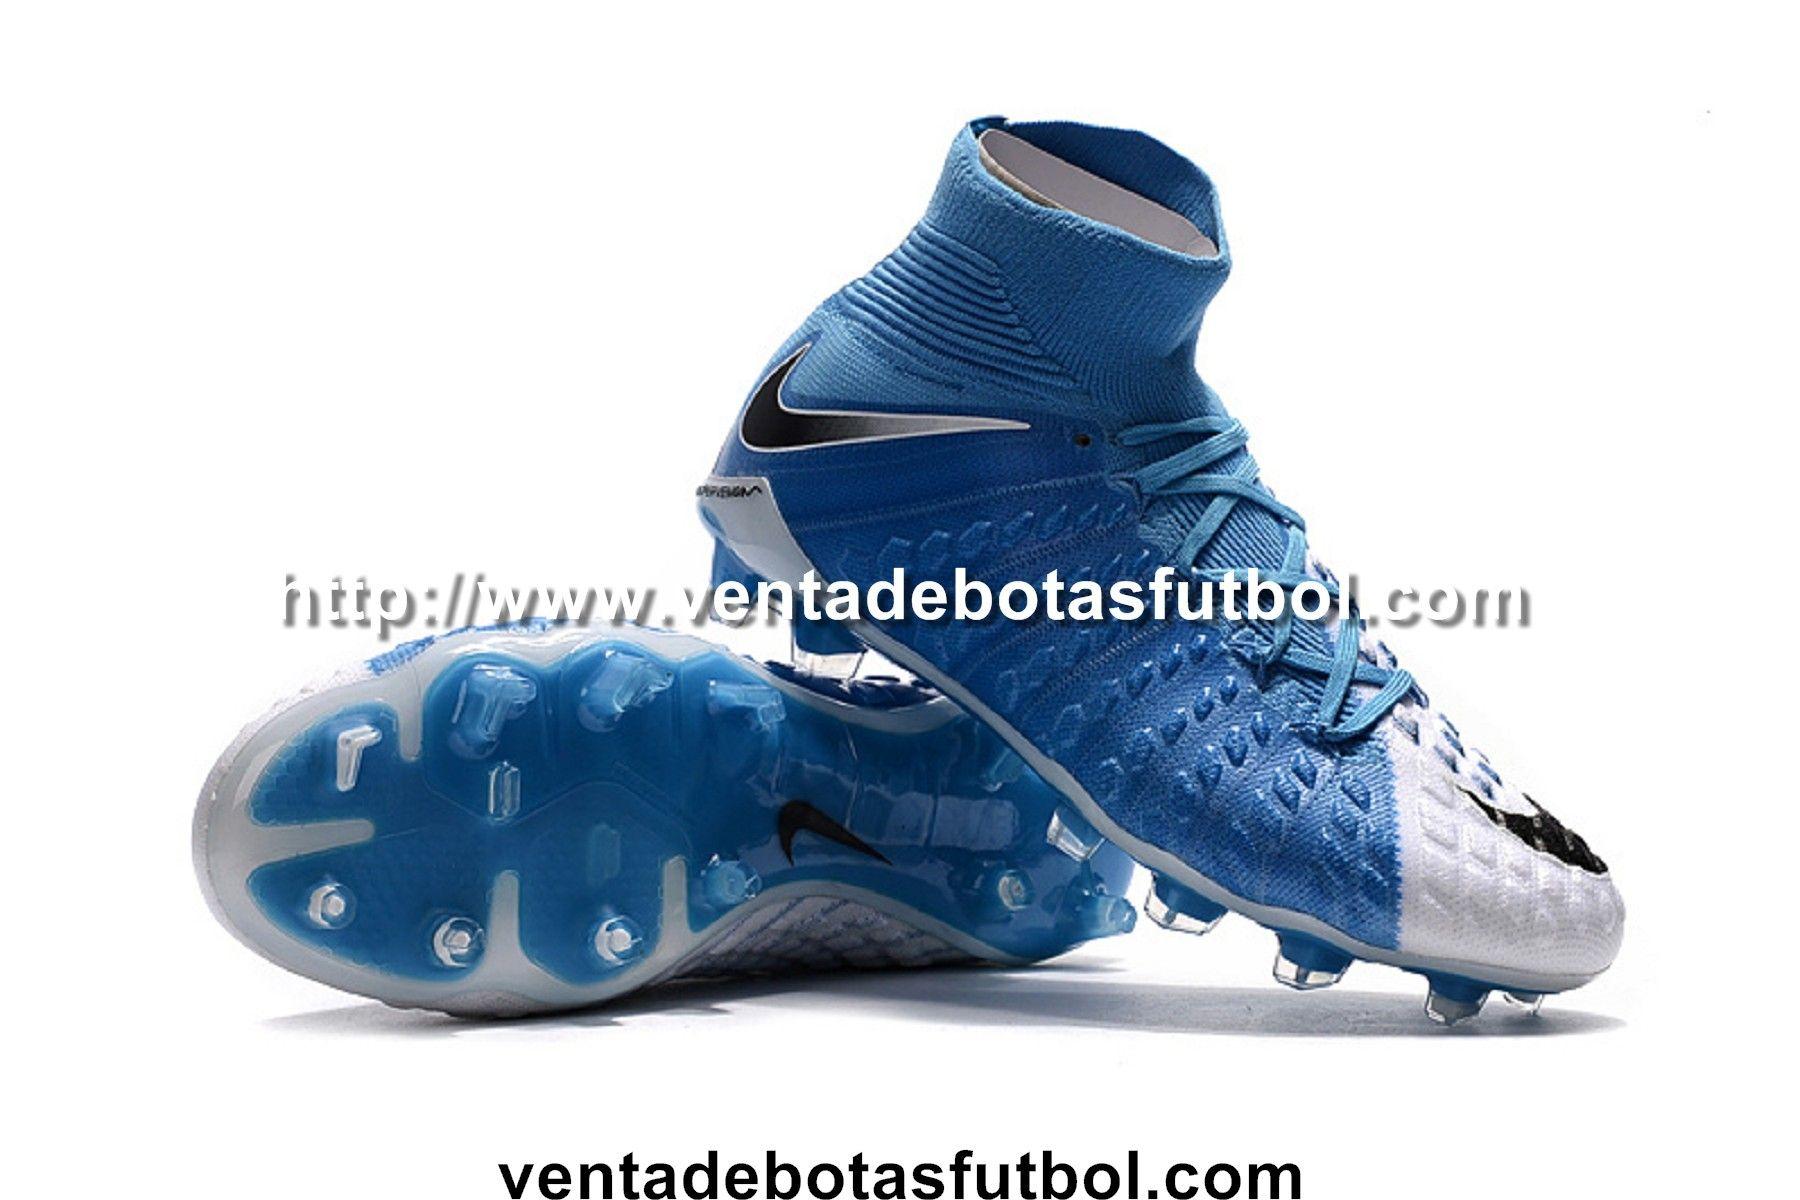 new products ddd4d d872b Shop Botas De Futbol Nike Niños Hypervenom Phantom III 3 DF FG - Azul Foto/